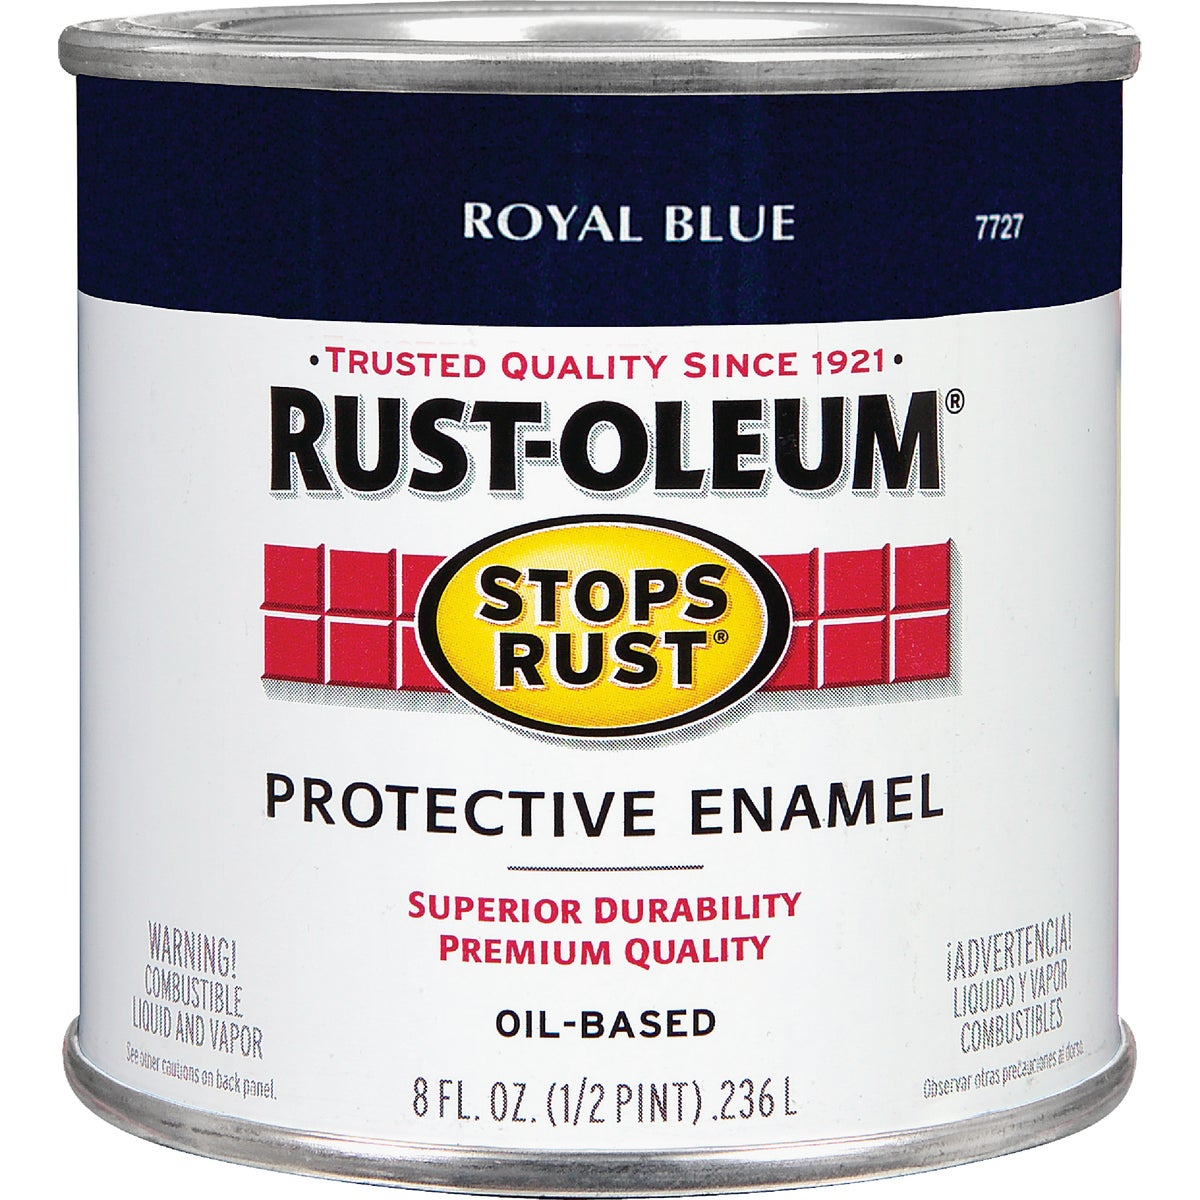 Rust Oleum ROYAL BLUE ENAMEL 7727-730